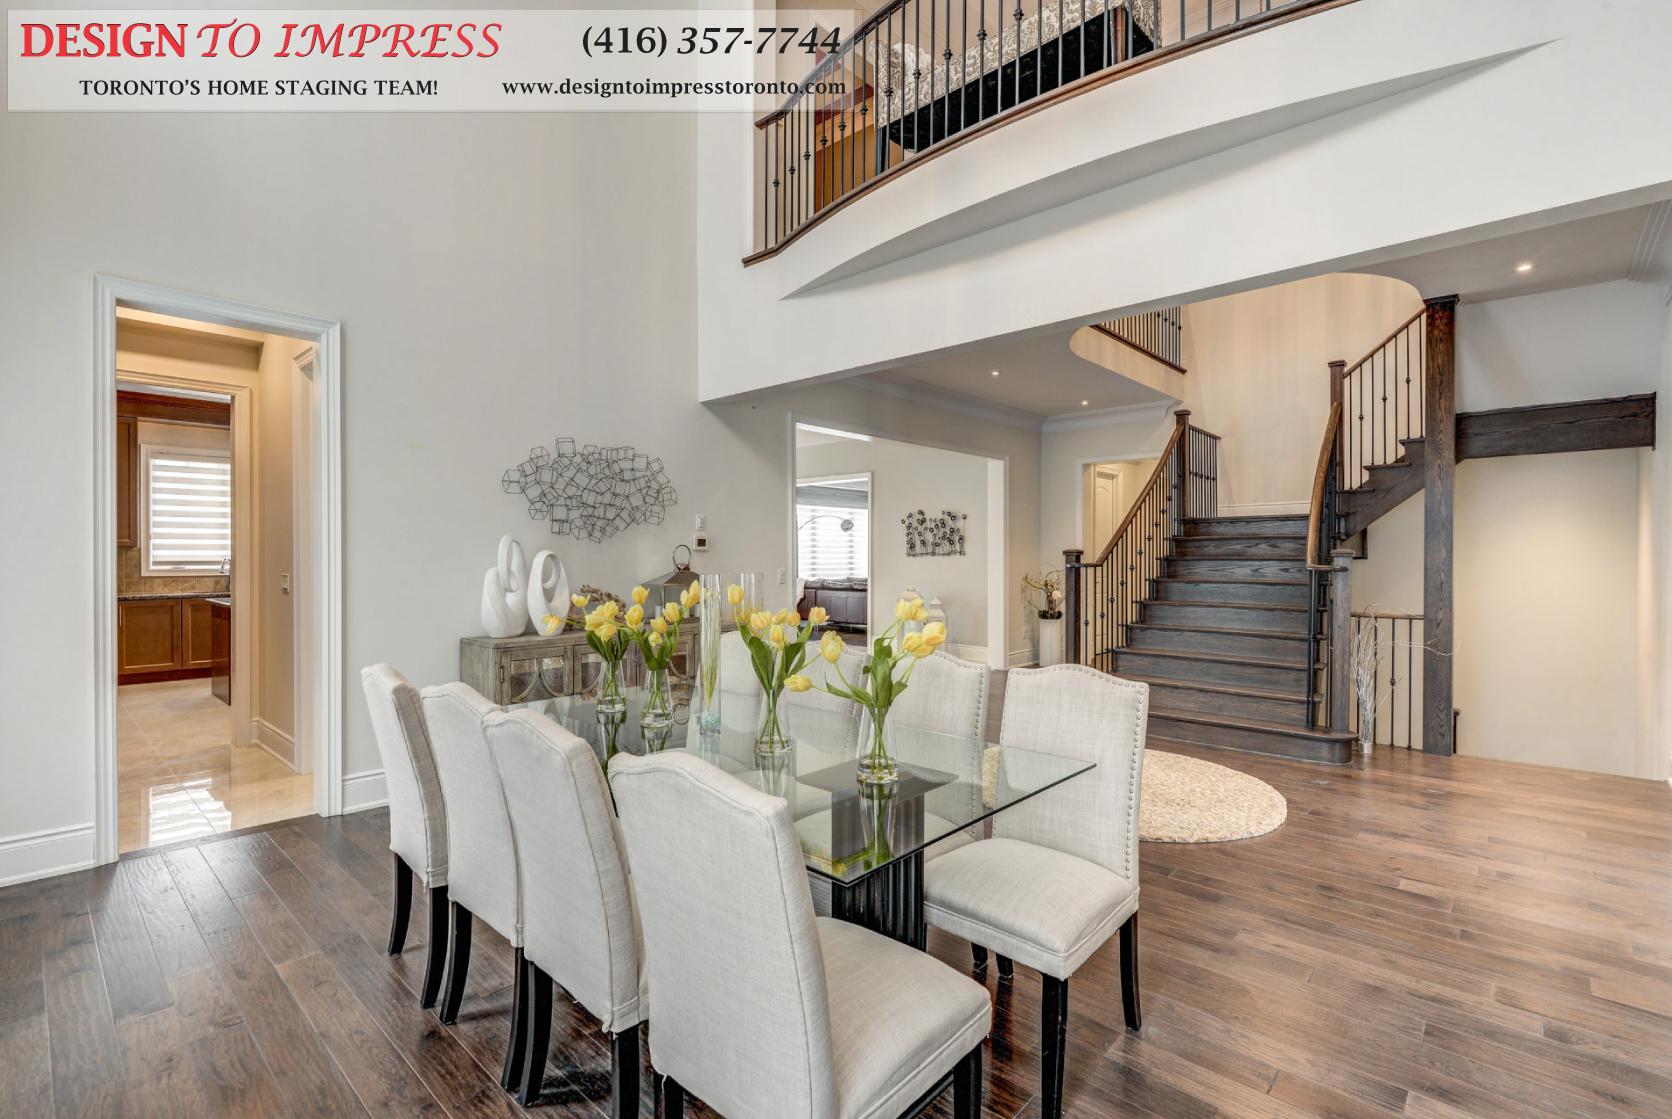 Dining Room, 30 Spain, Brampton Home Staging